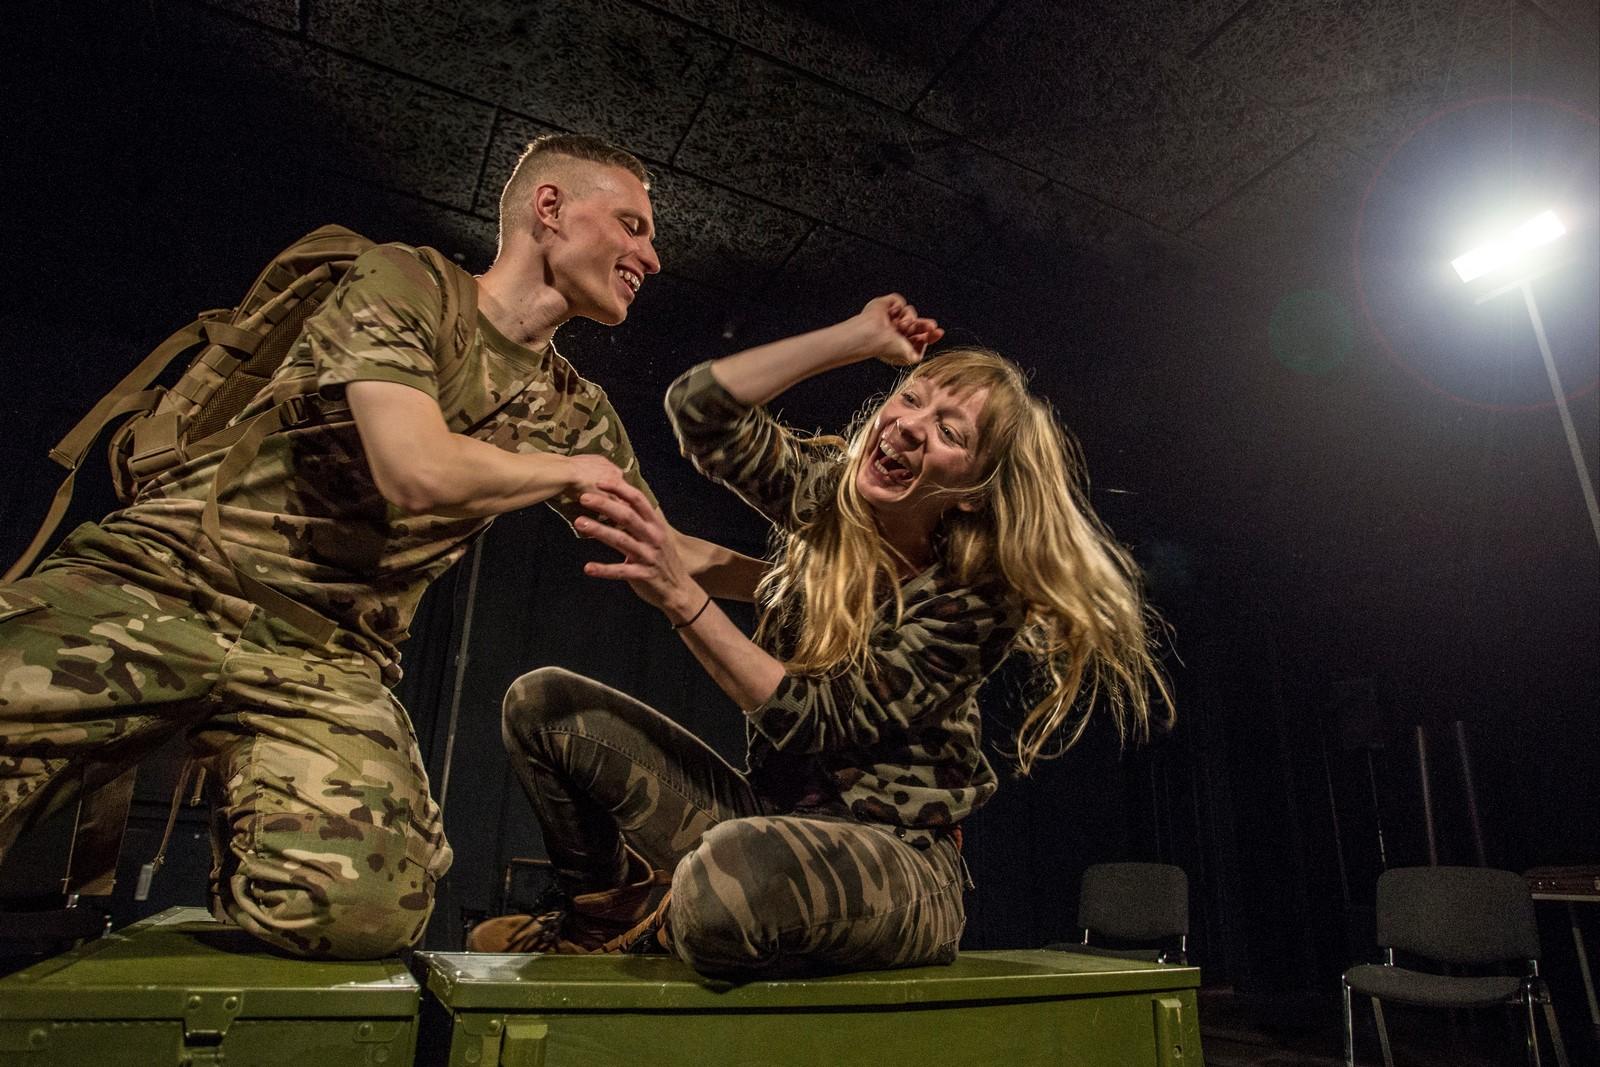 Anmeldelse: Soldaten, Teatret Fair Play